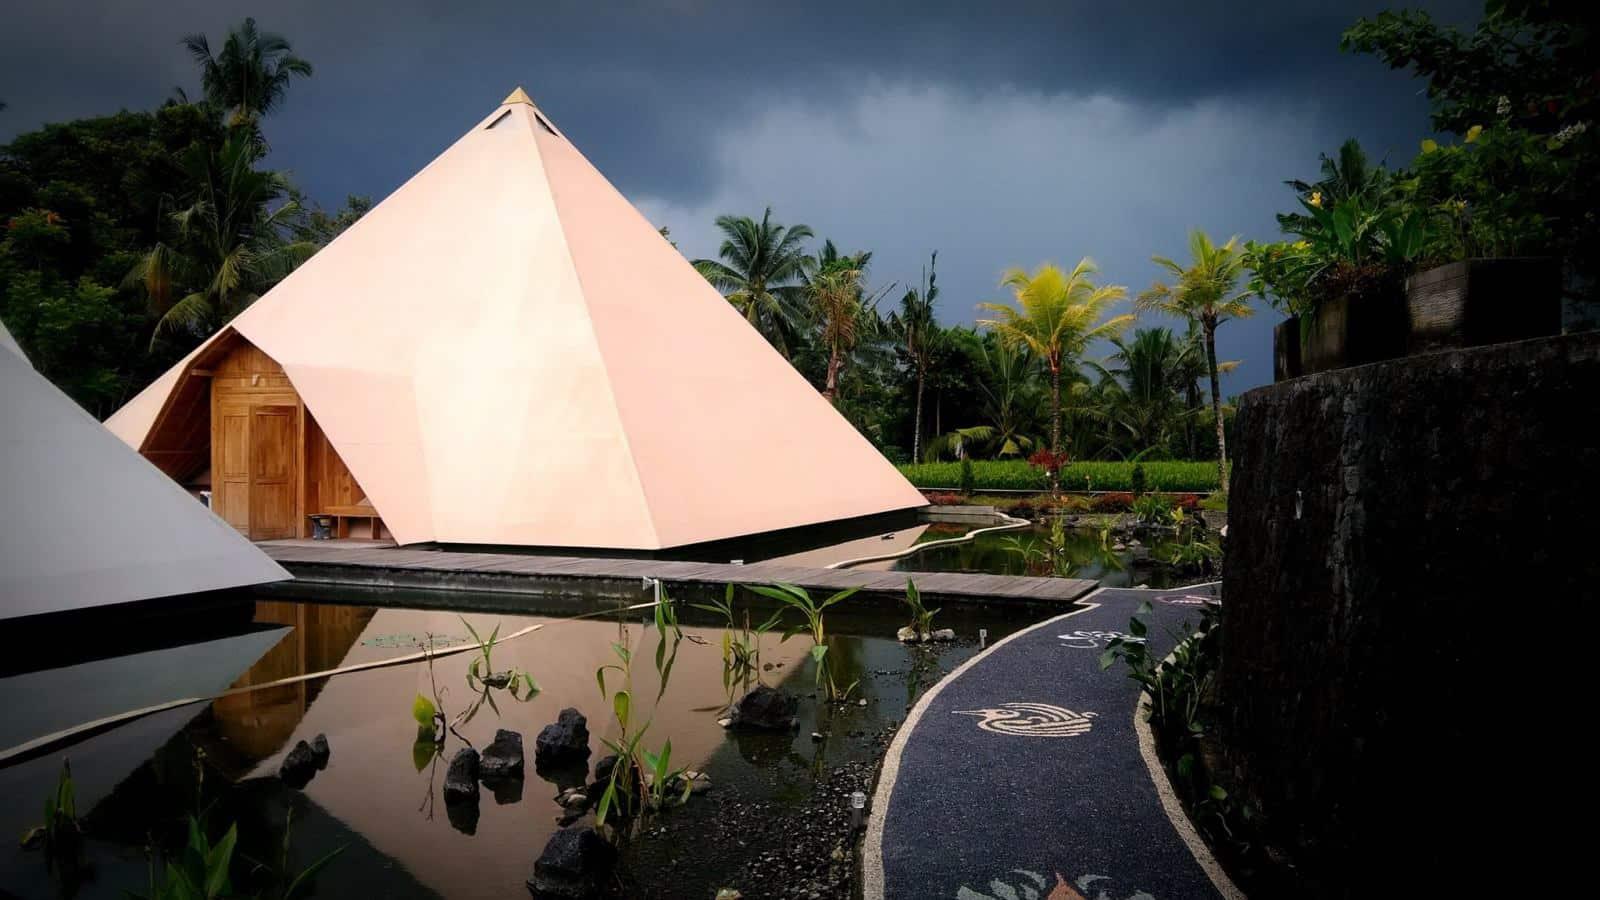 Bali Reise 4 Pyramids of Chi